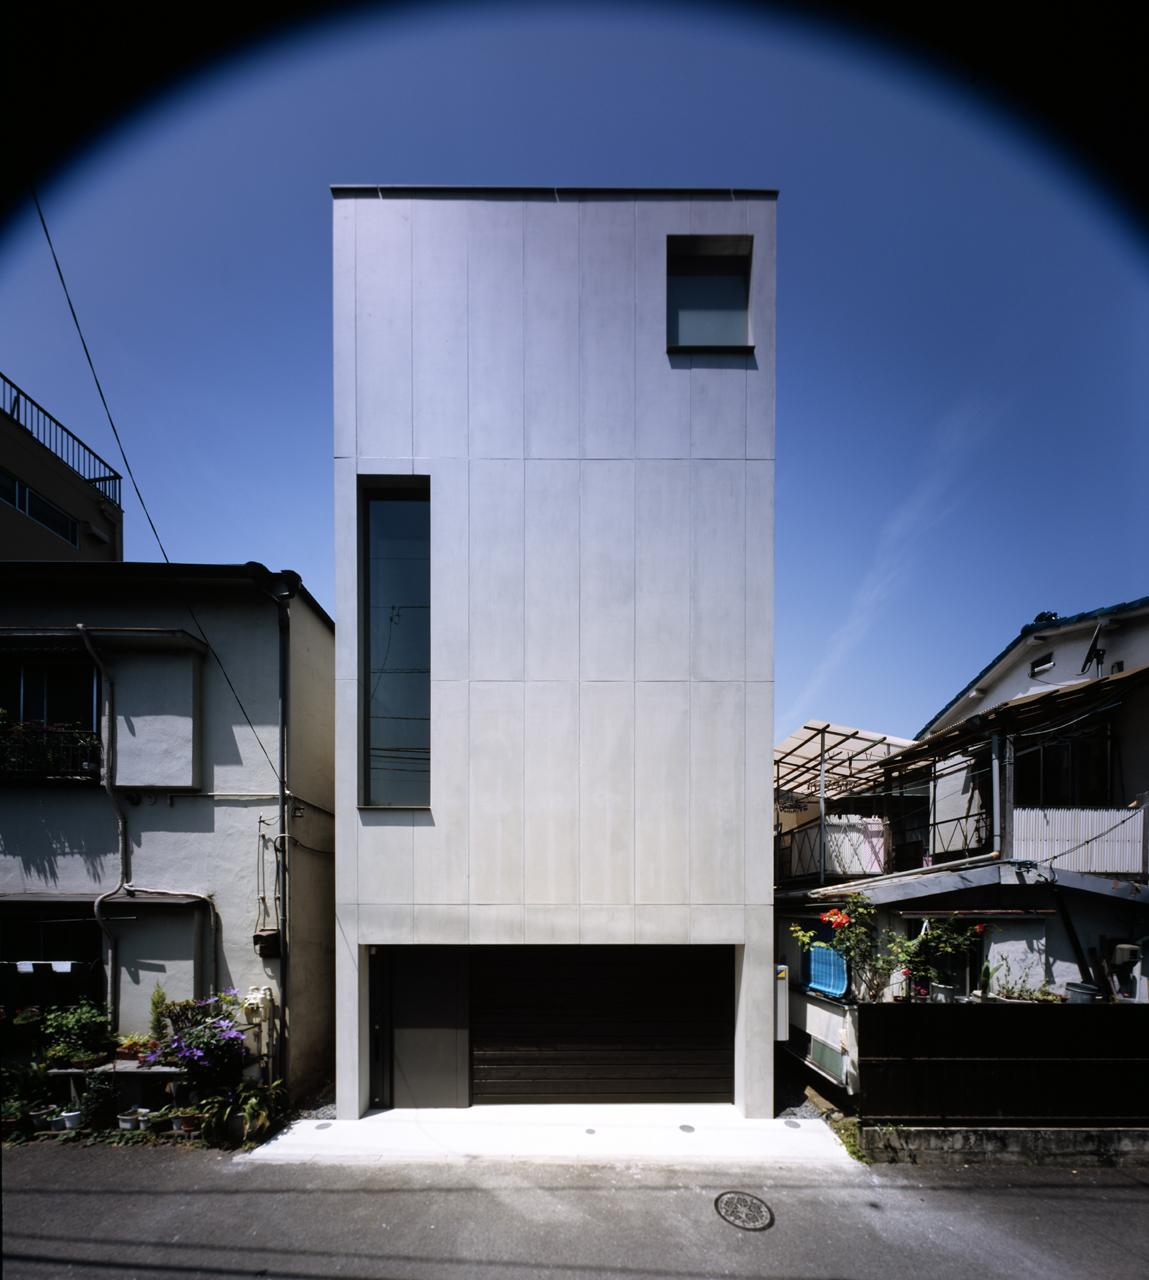 Casa de 2 pátios / Keiji Ashizawa Design, © Daici Ano